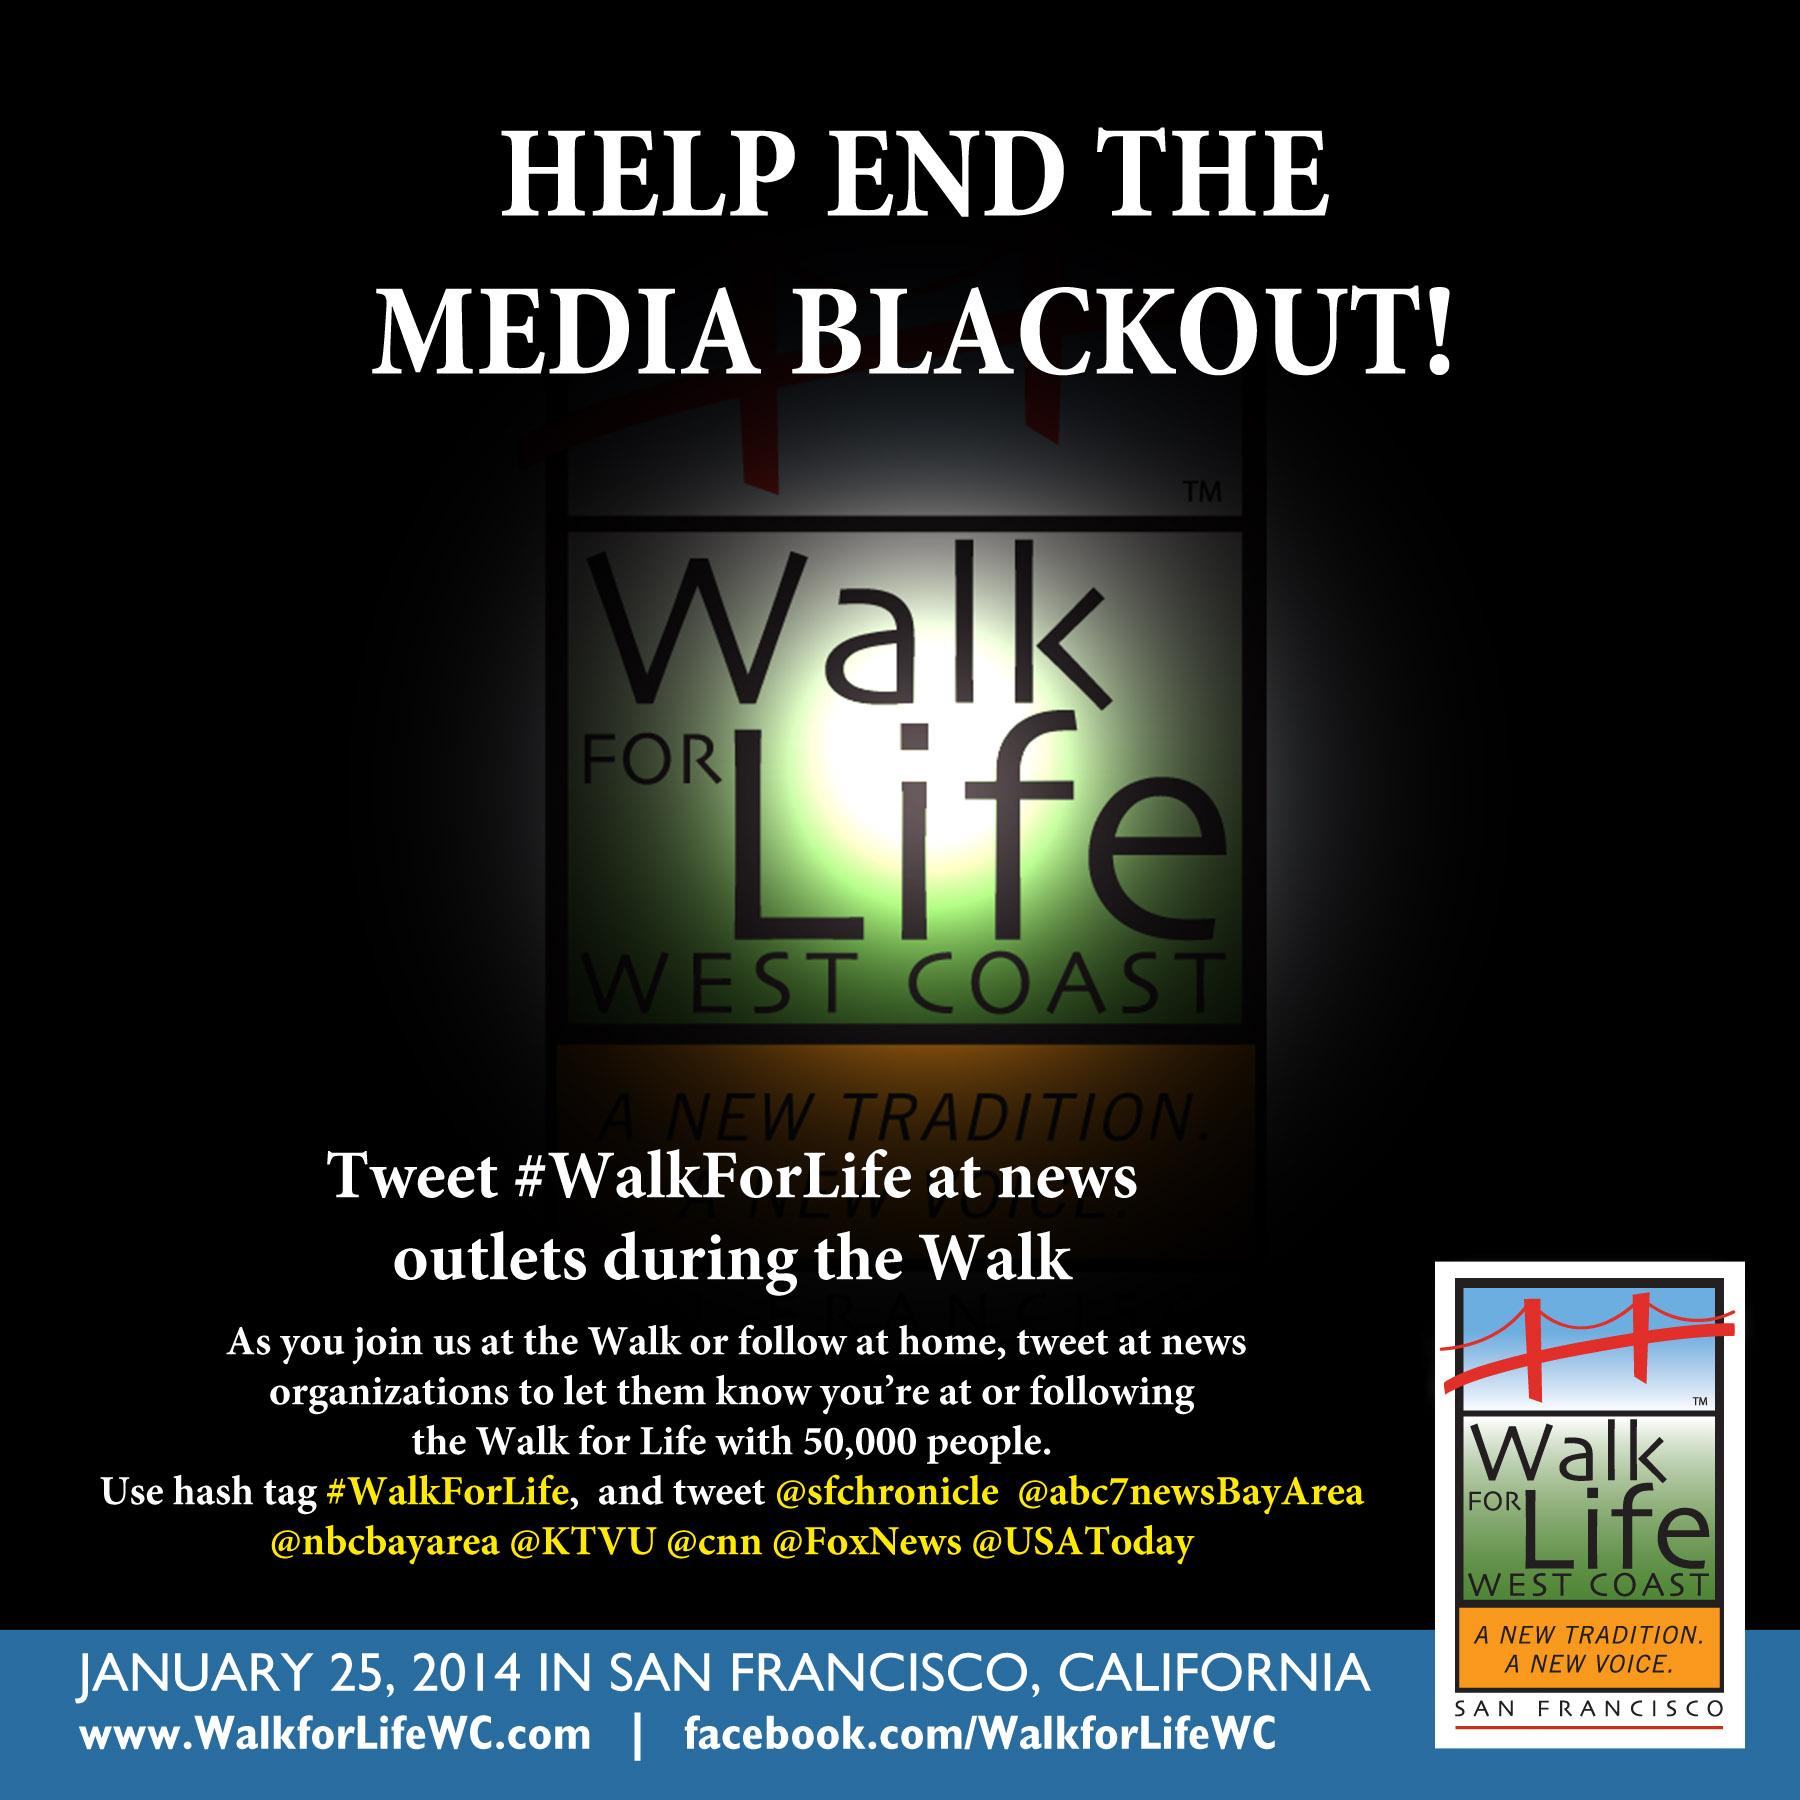 Goodbye, Media Blackout. Hello, #WalkforLife